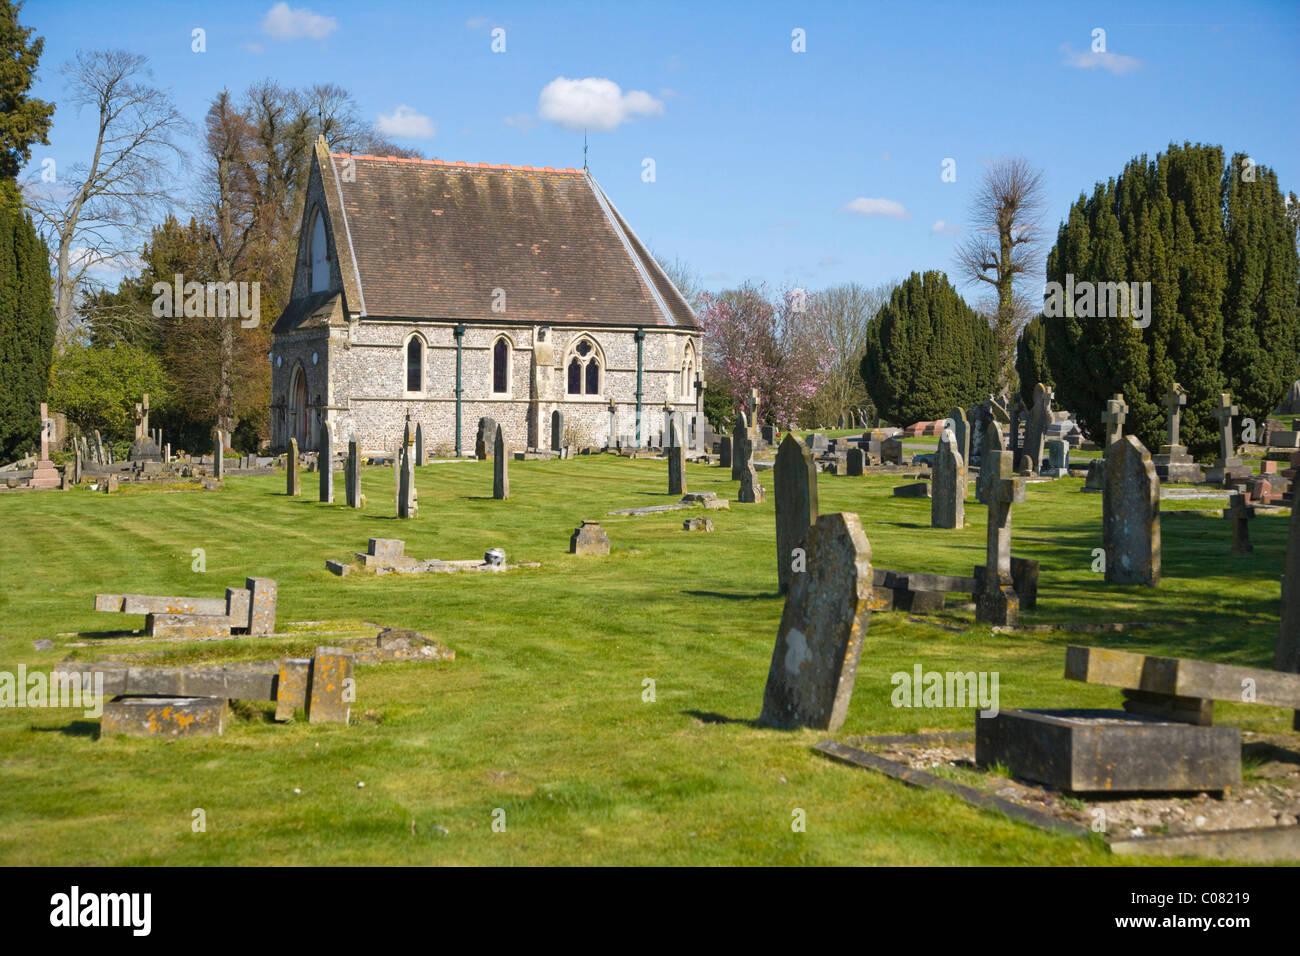 St Mary's Churchyard with Andover Chapel, Chapel Arts, Andover, Hampshire, England, United Kingdom, Europe - Stock Image